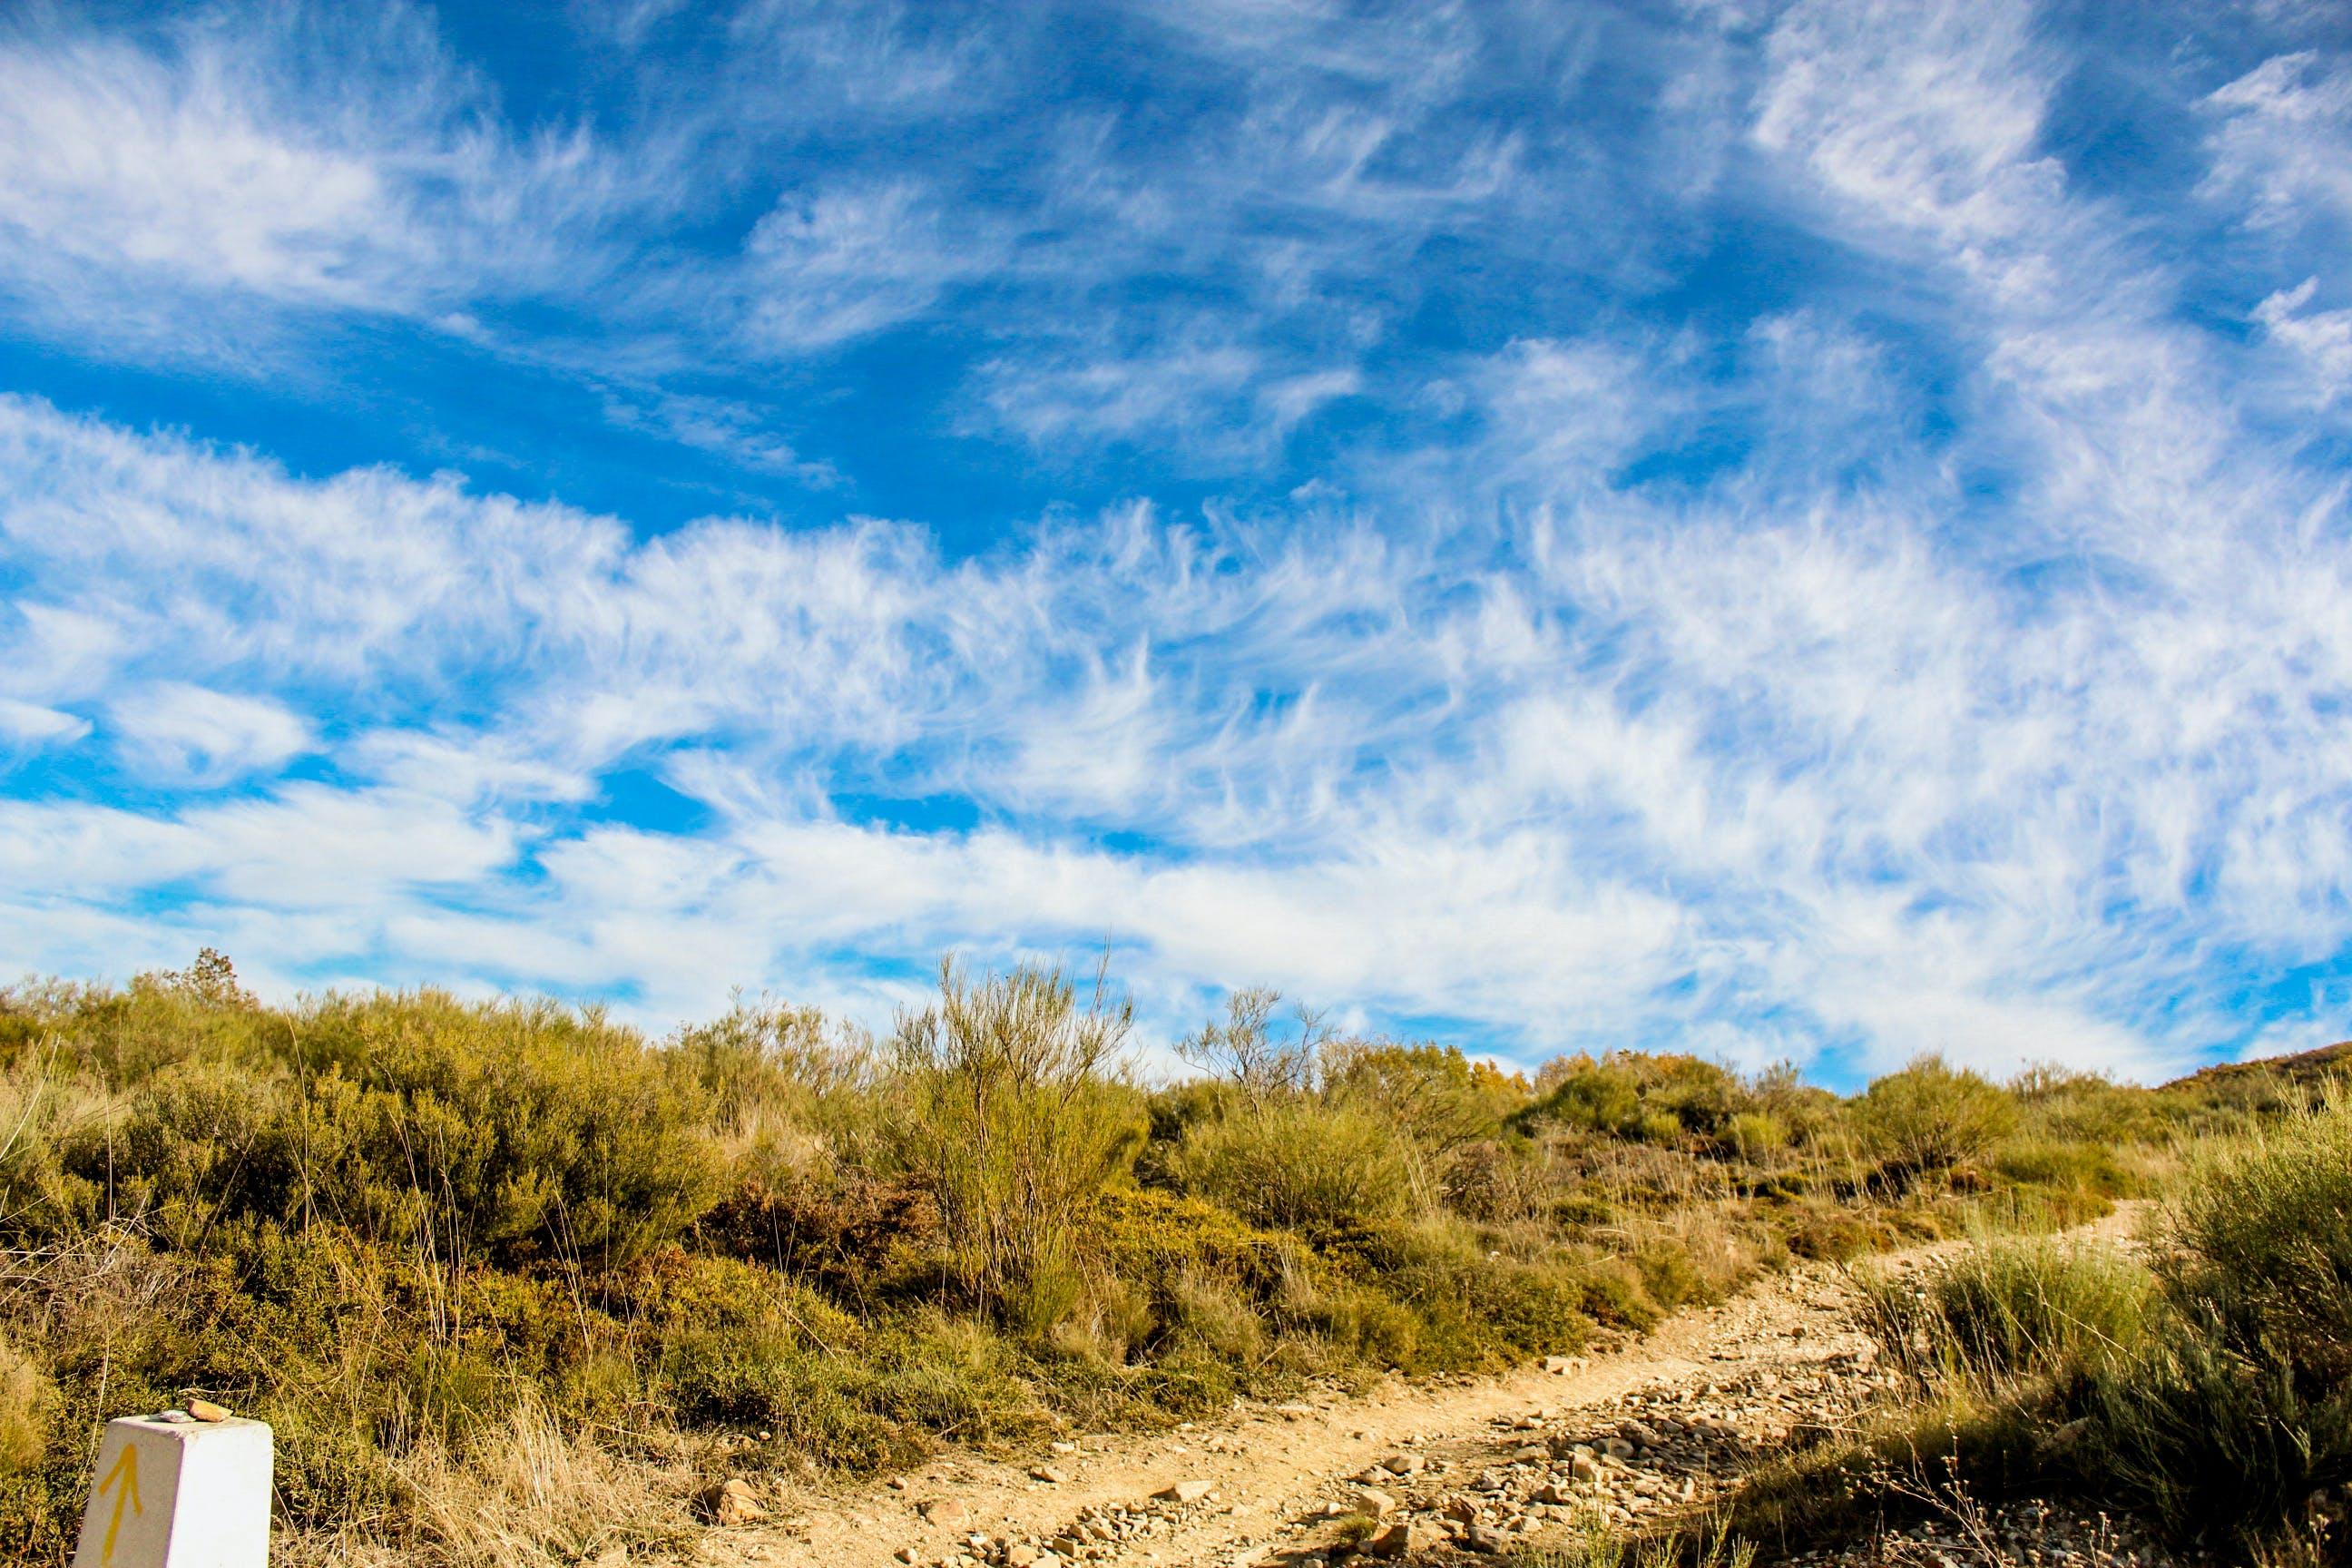 Fotos de stock gratuitas de azul, camino de tierra, carretera, césped